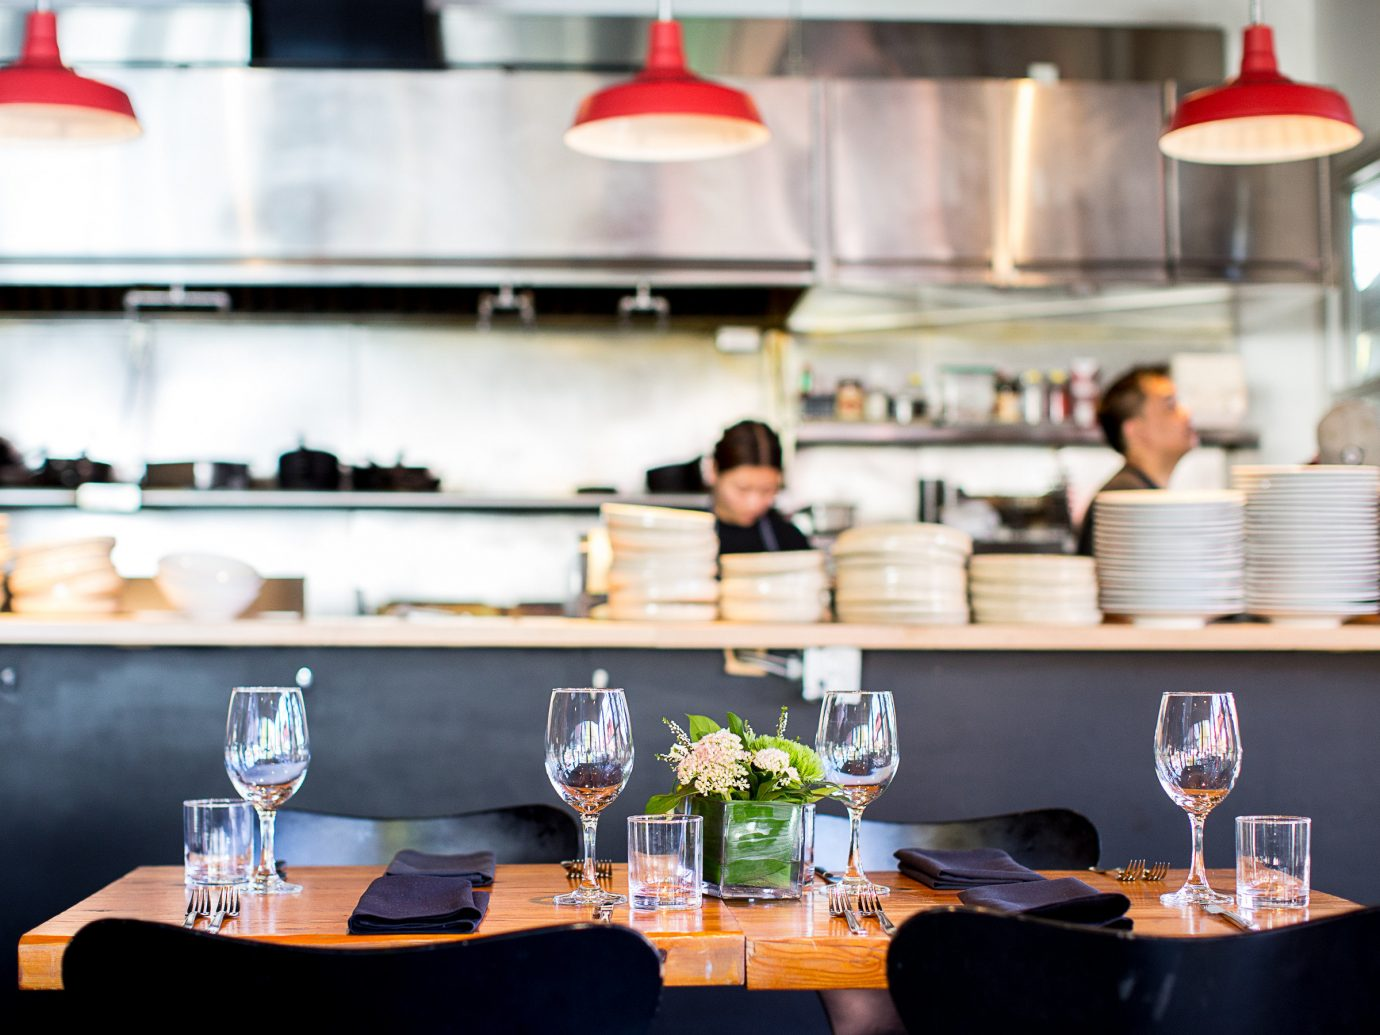 Trip Ideas indoor meal restaurant brunch interior design food cuisine table